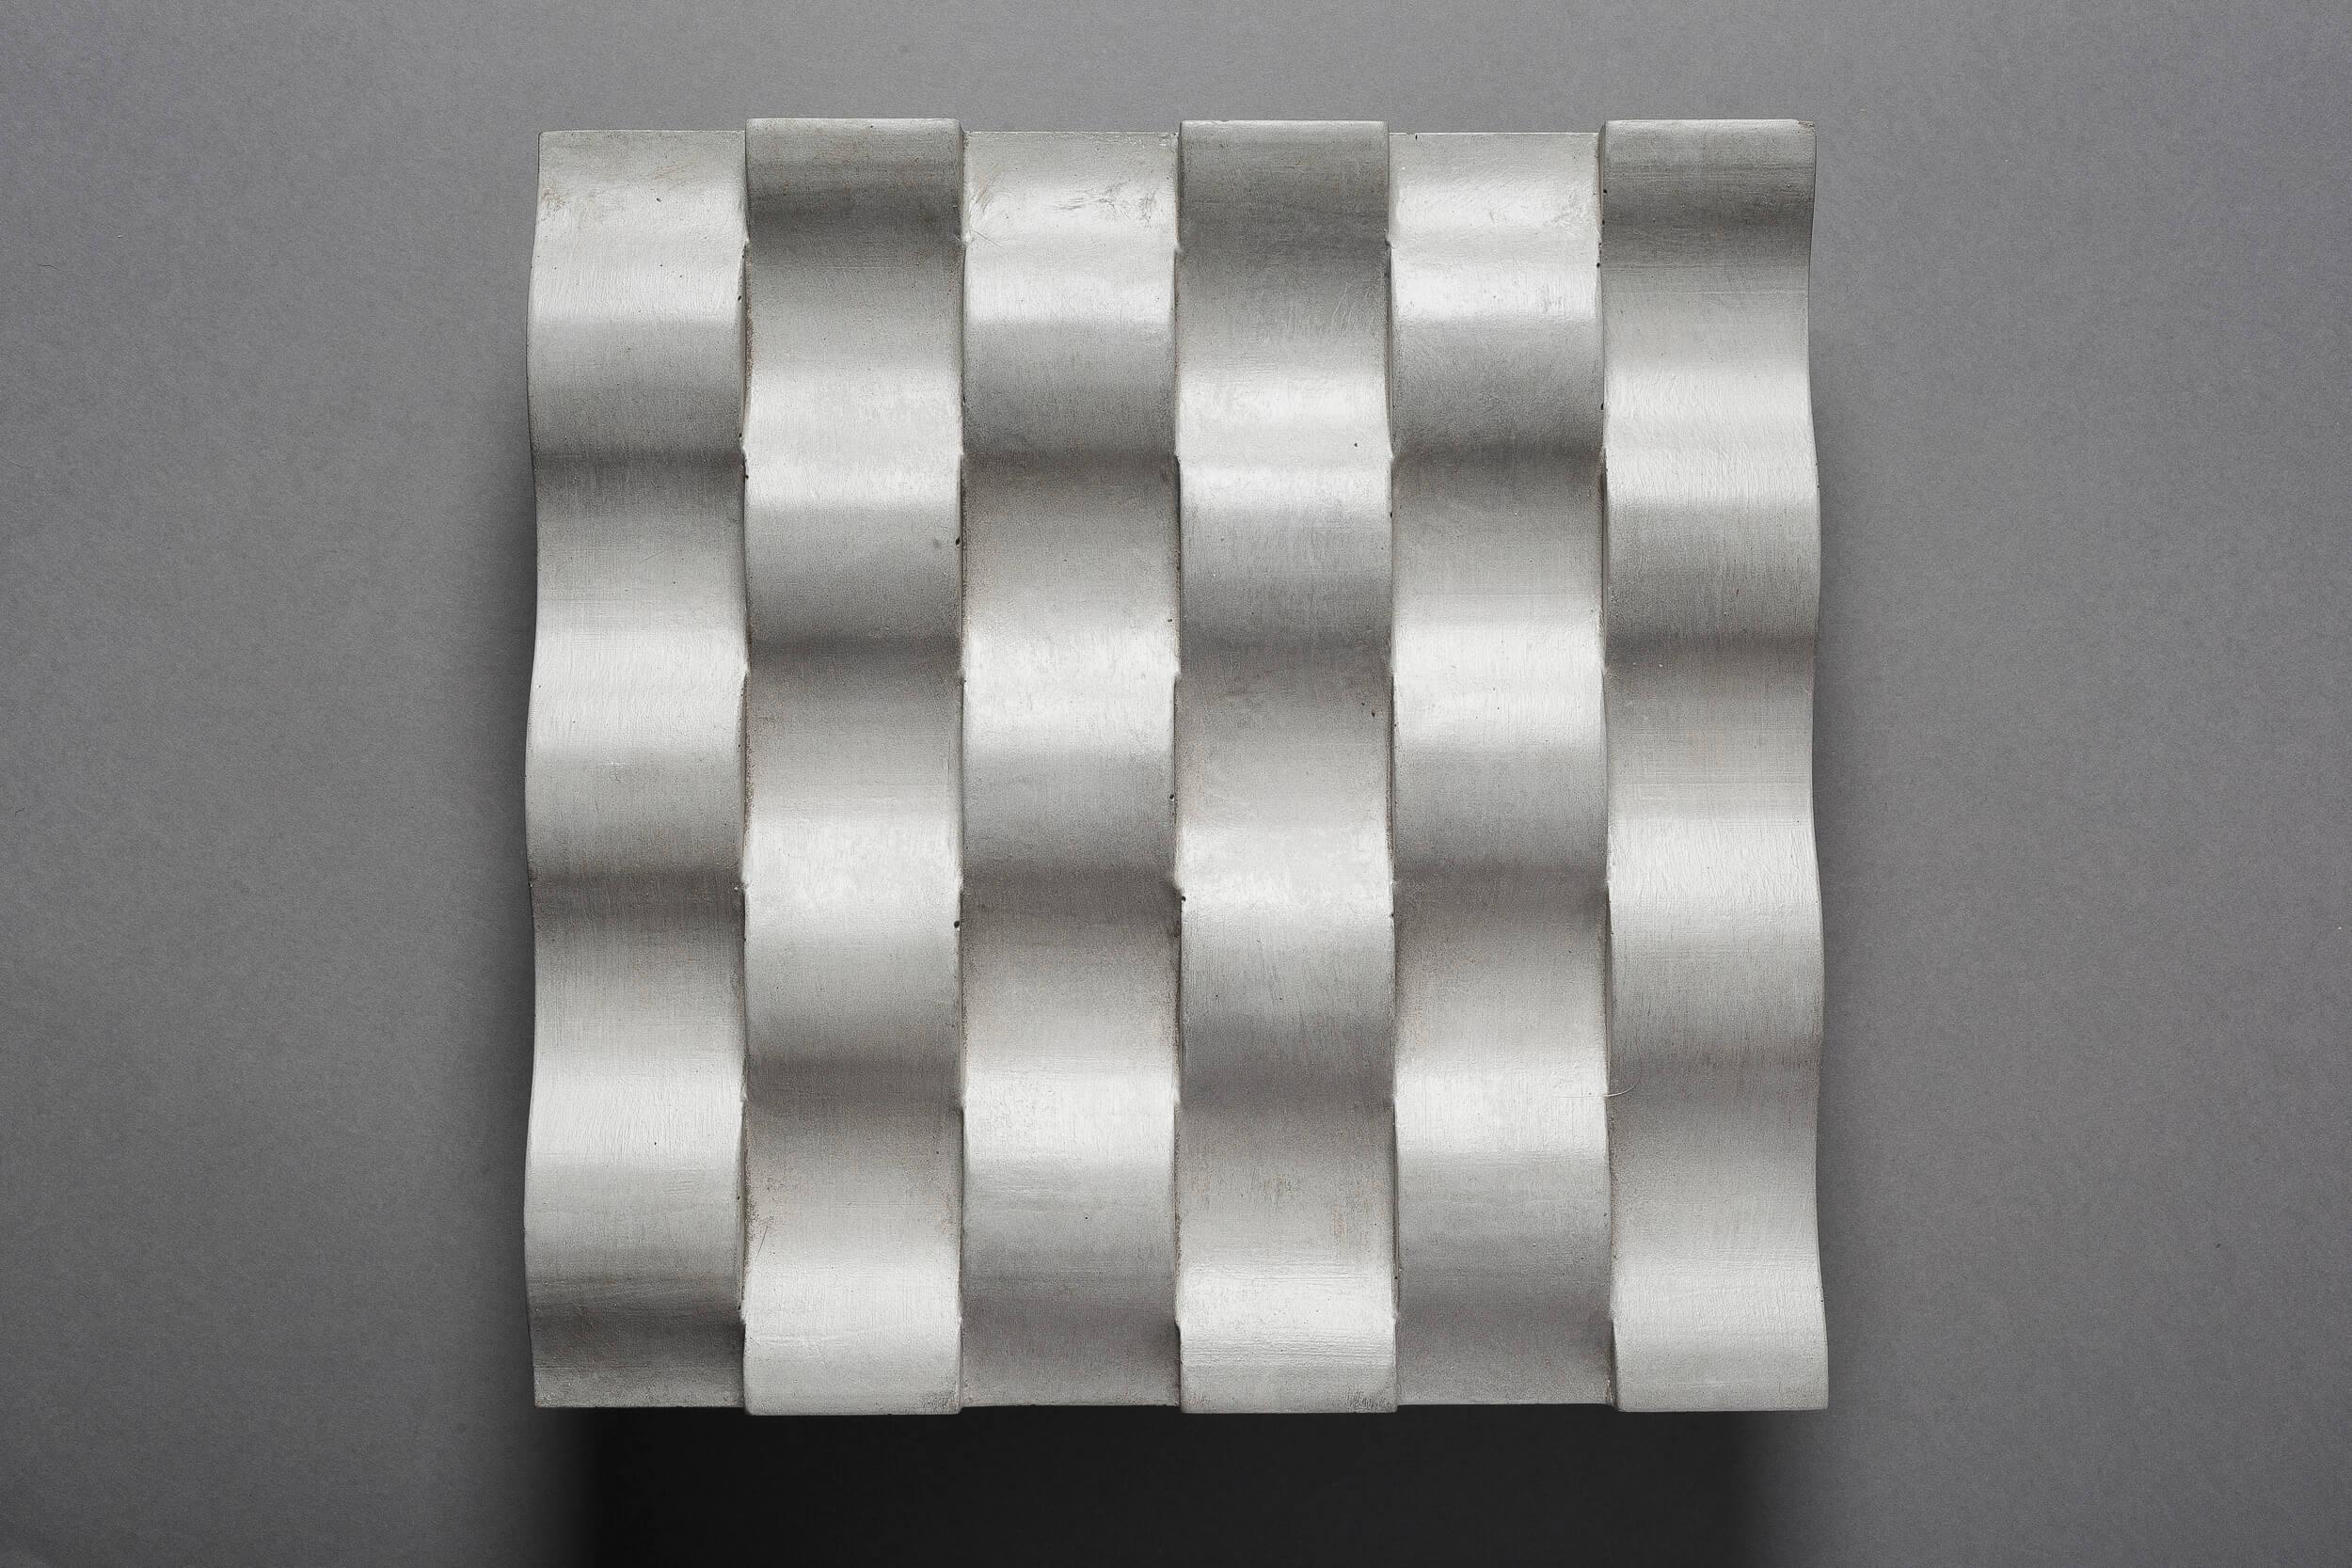 Plaster_studio_tile_17_concrete